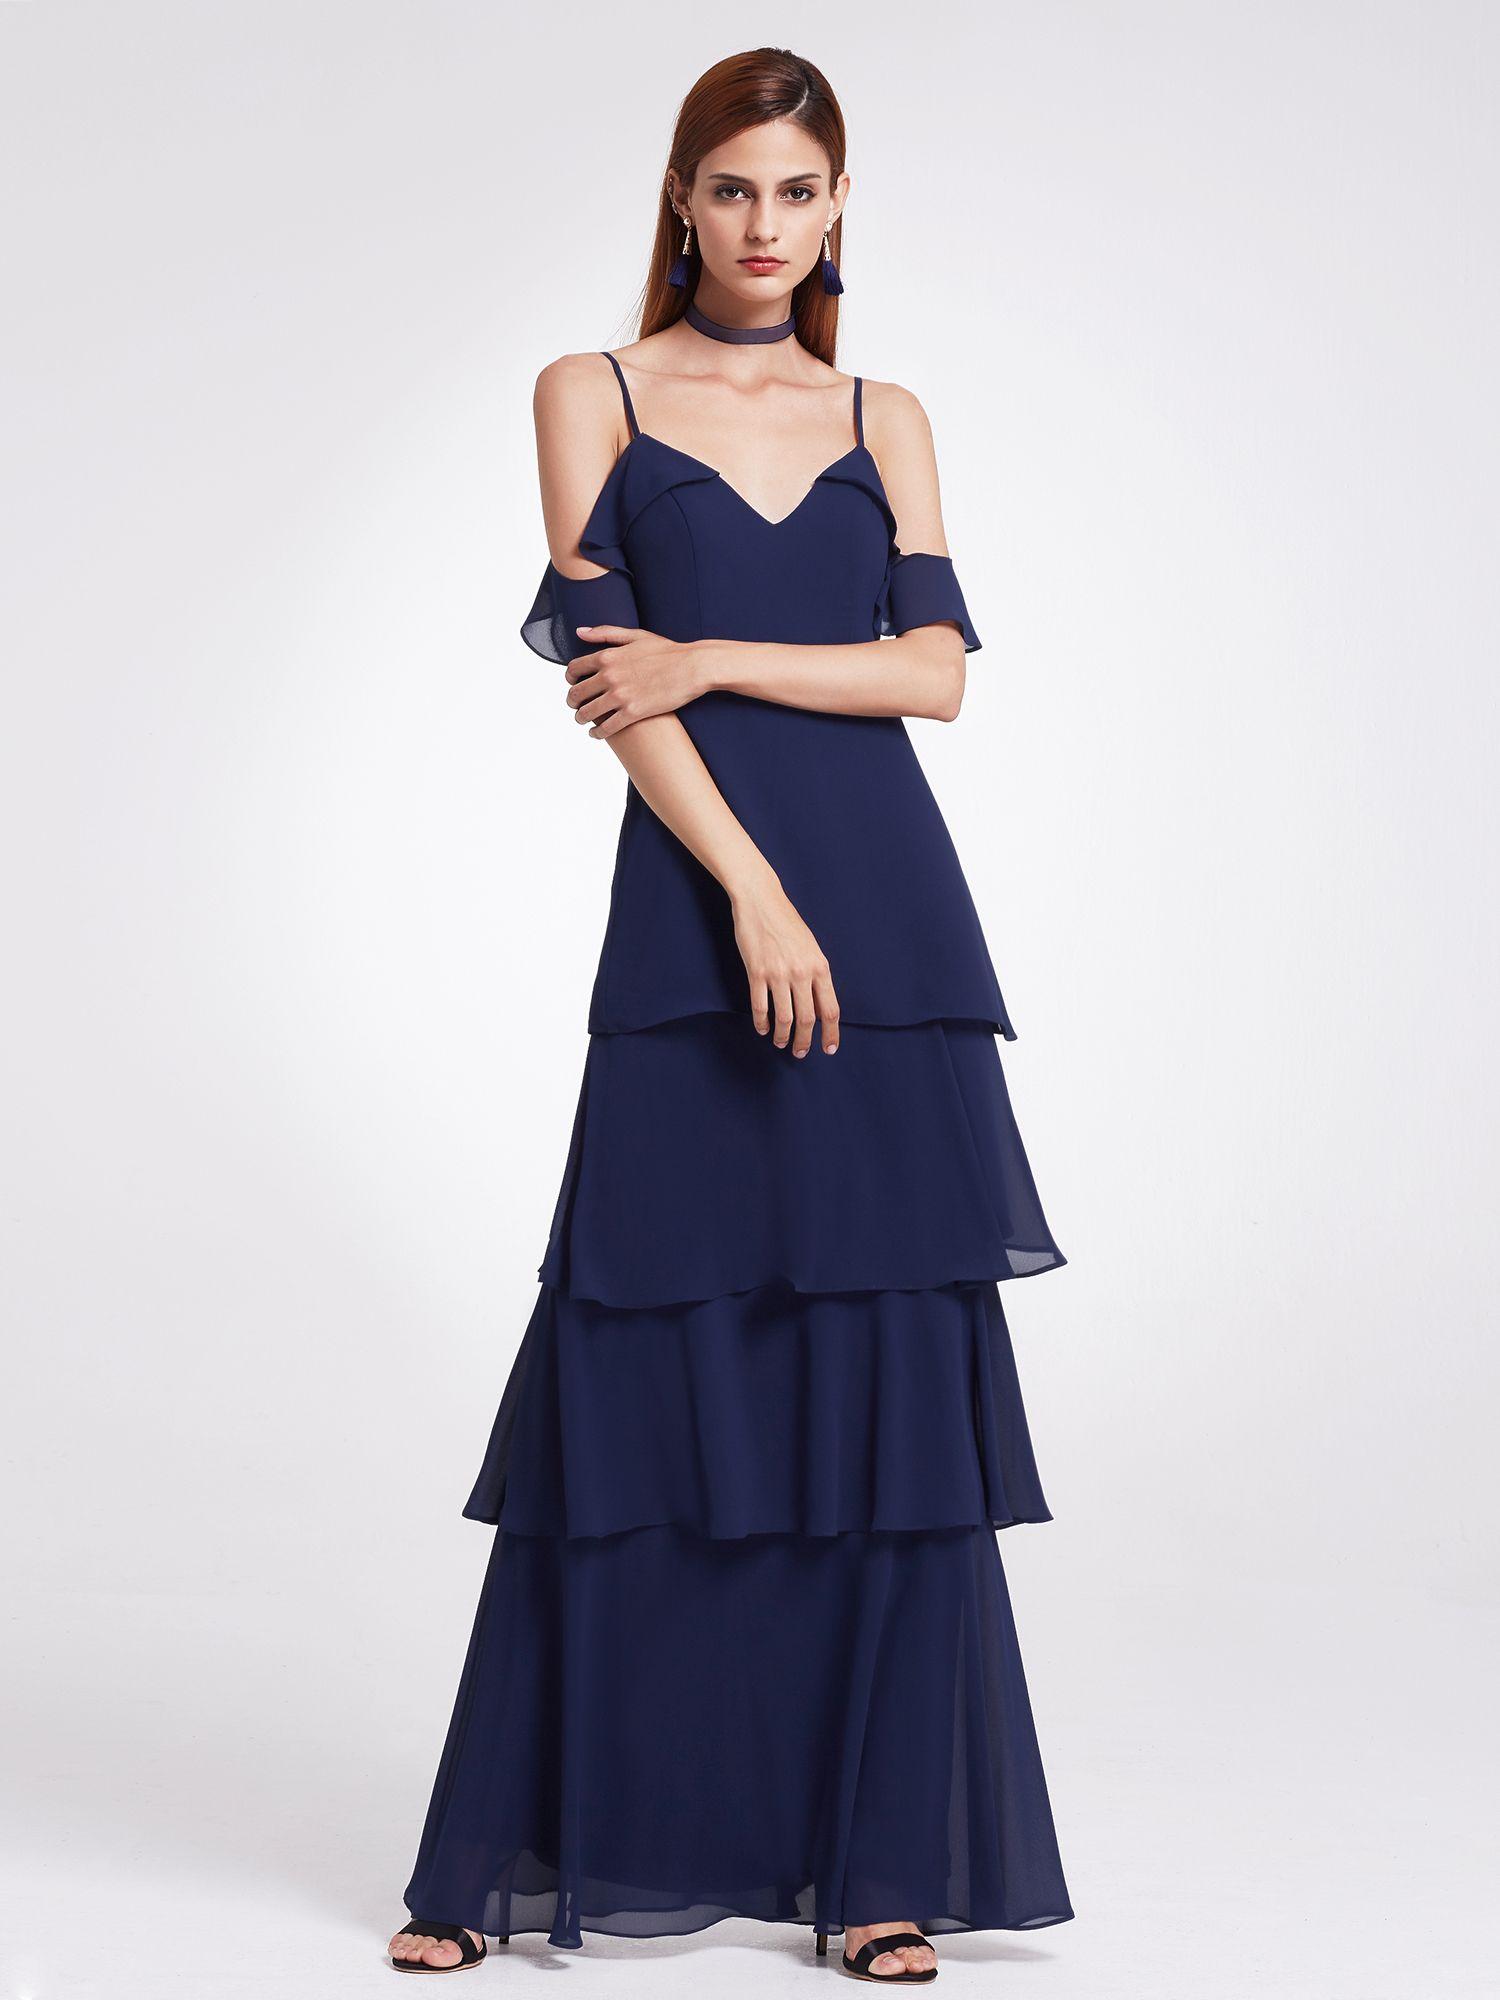 15c0876426f Ever-Pretty Women s Elegant Long Maxi Off Shoulder V-Neck Ruffled Flowy  Wedding Guest Bridesmaid Formal Dresses for Women 07202 Navy Blue US 6  Shoulder